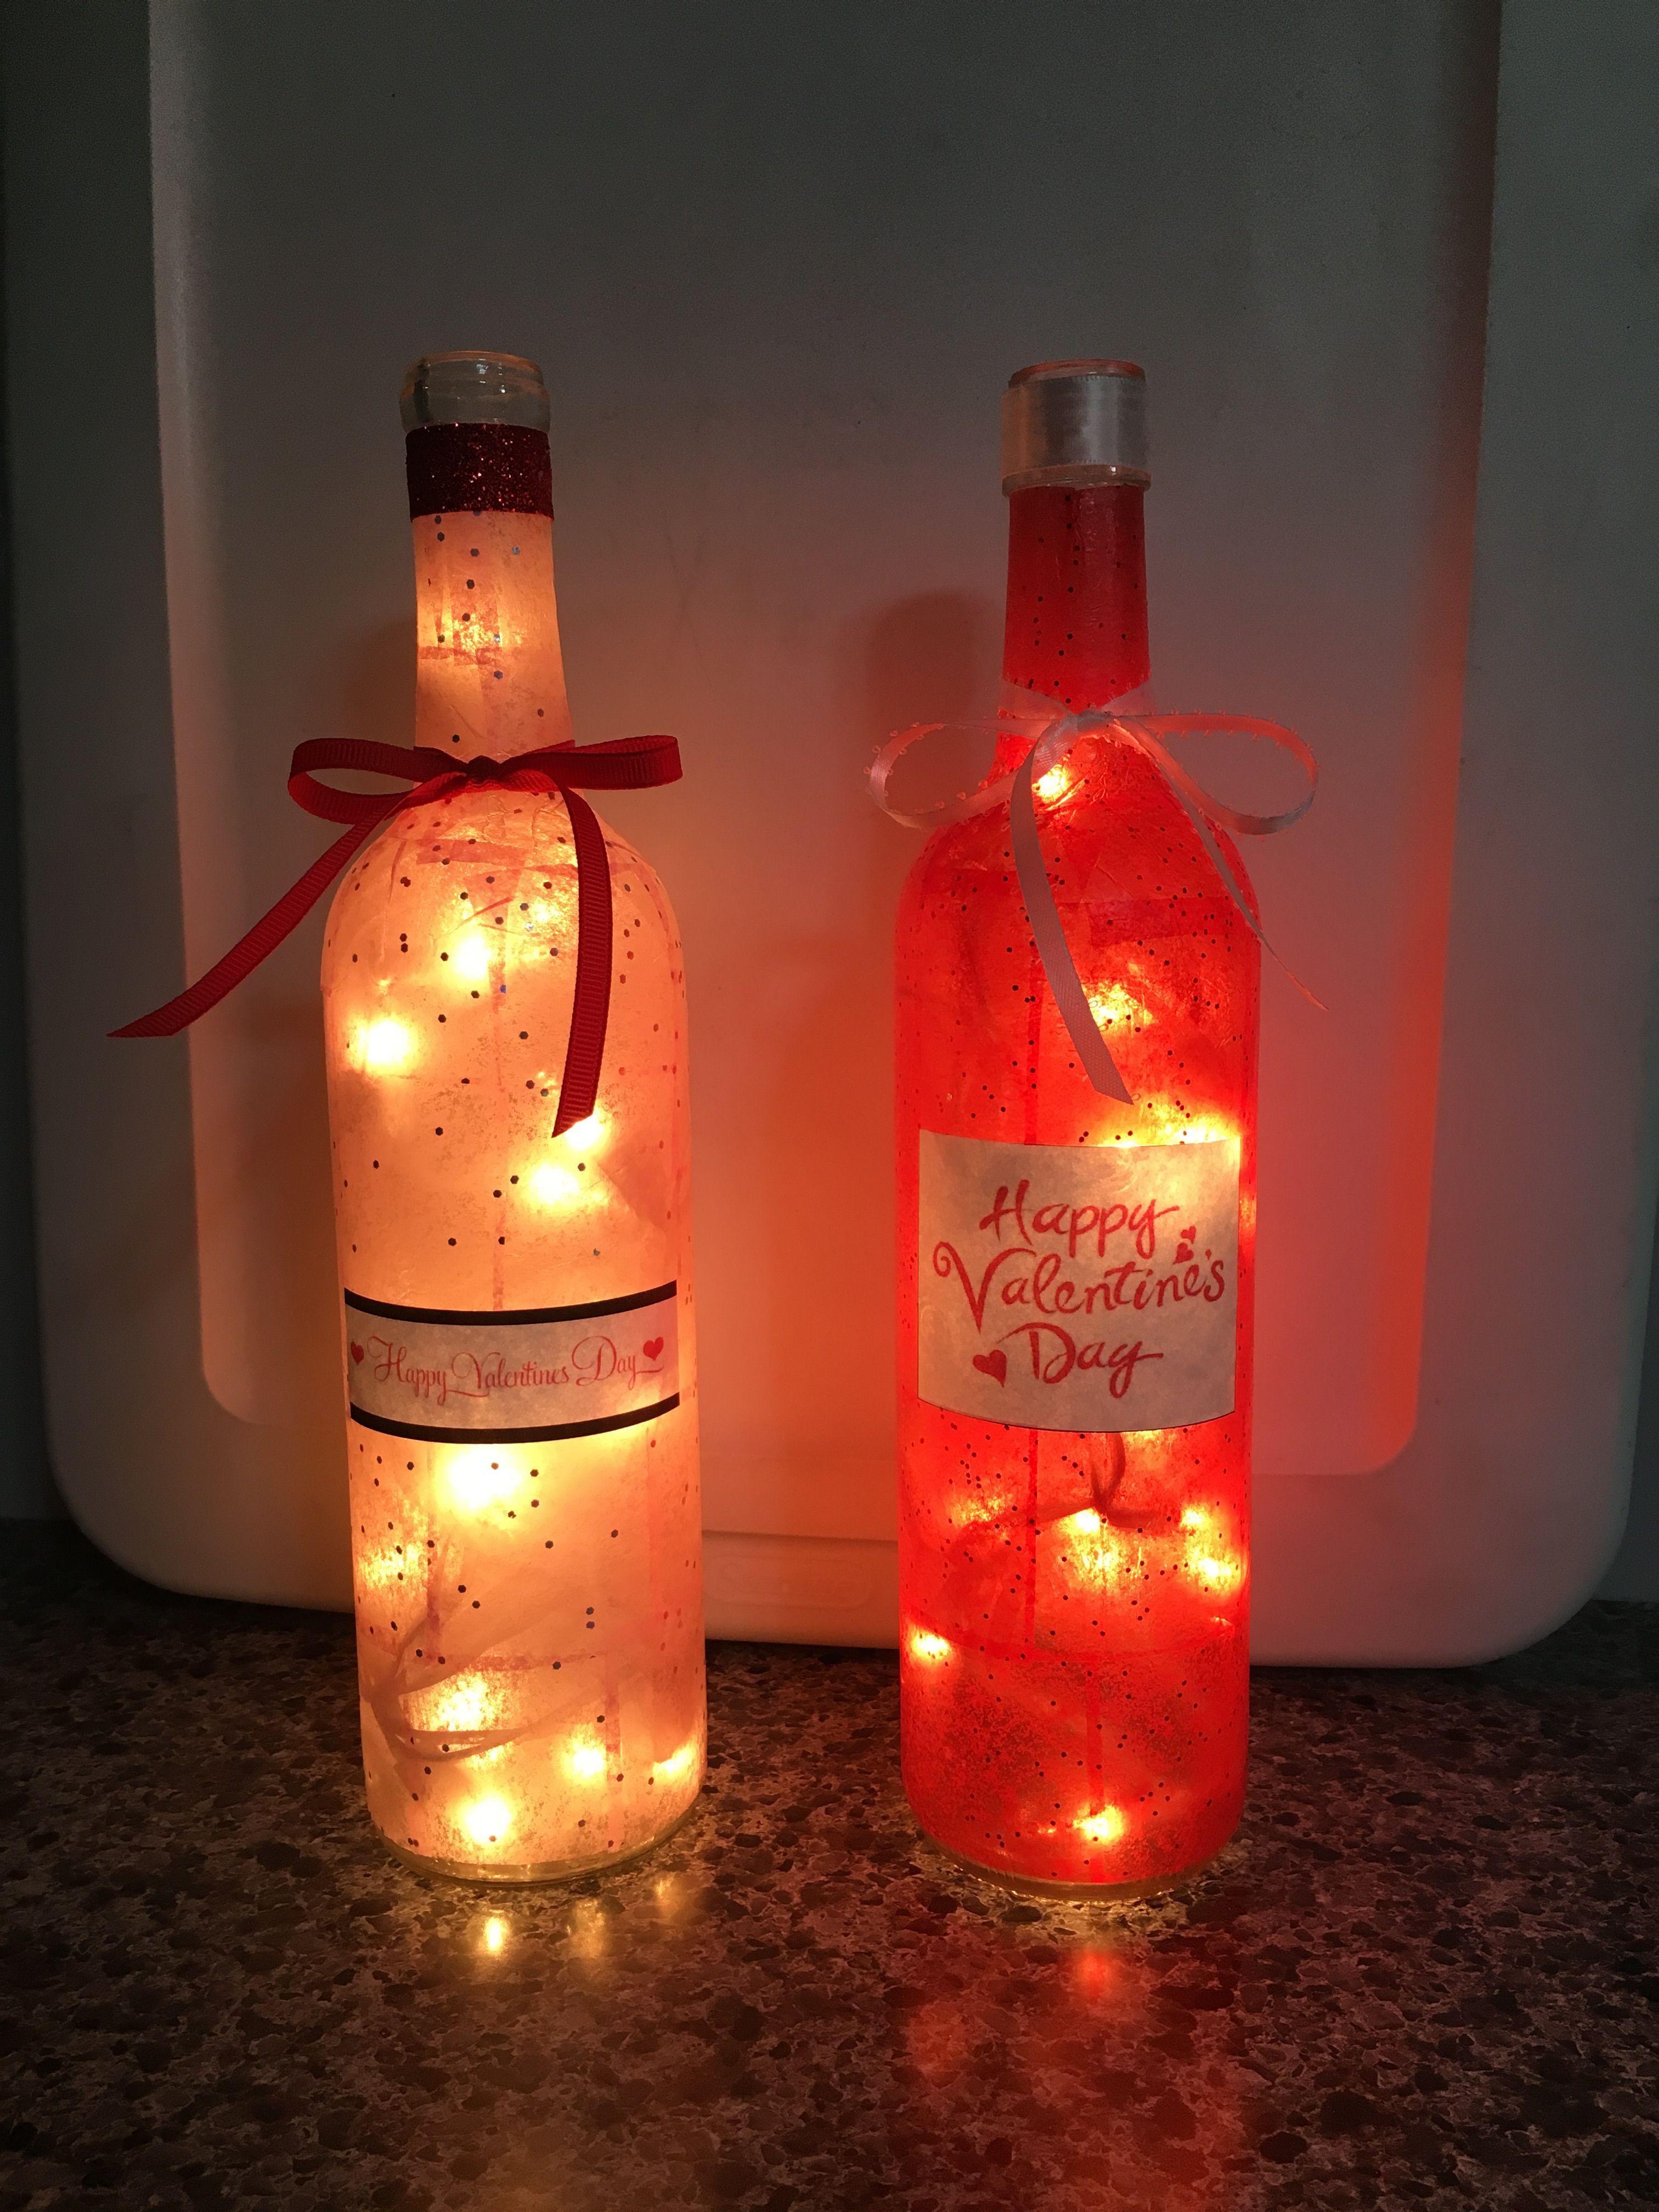 Valentines Day Wine Bottle Lamps Wine Bottle Candles Valentines Wine Bottles Wine Bottle Crafts